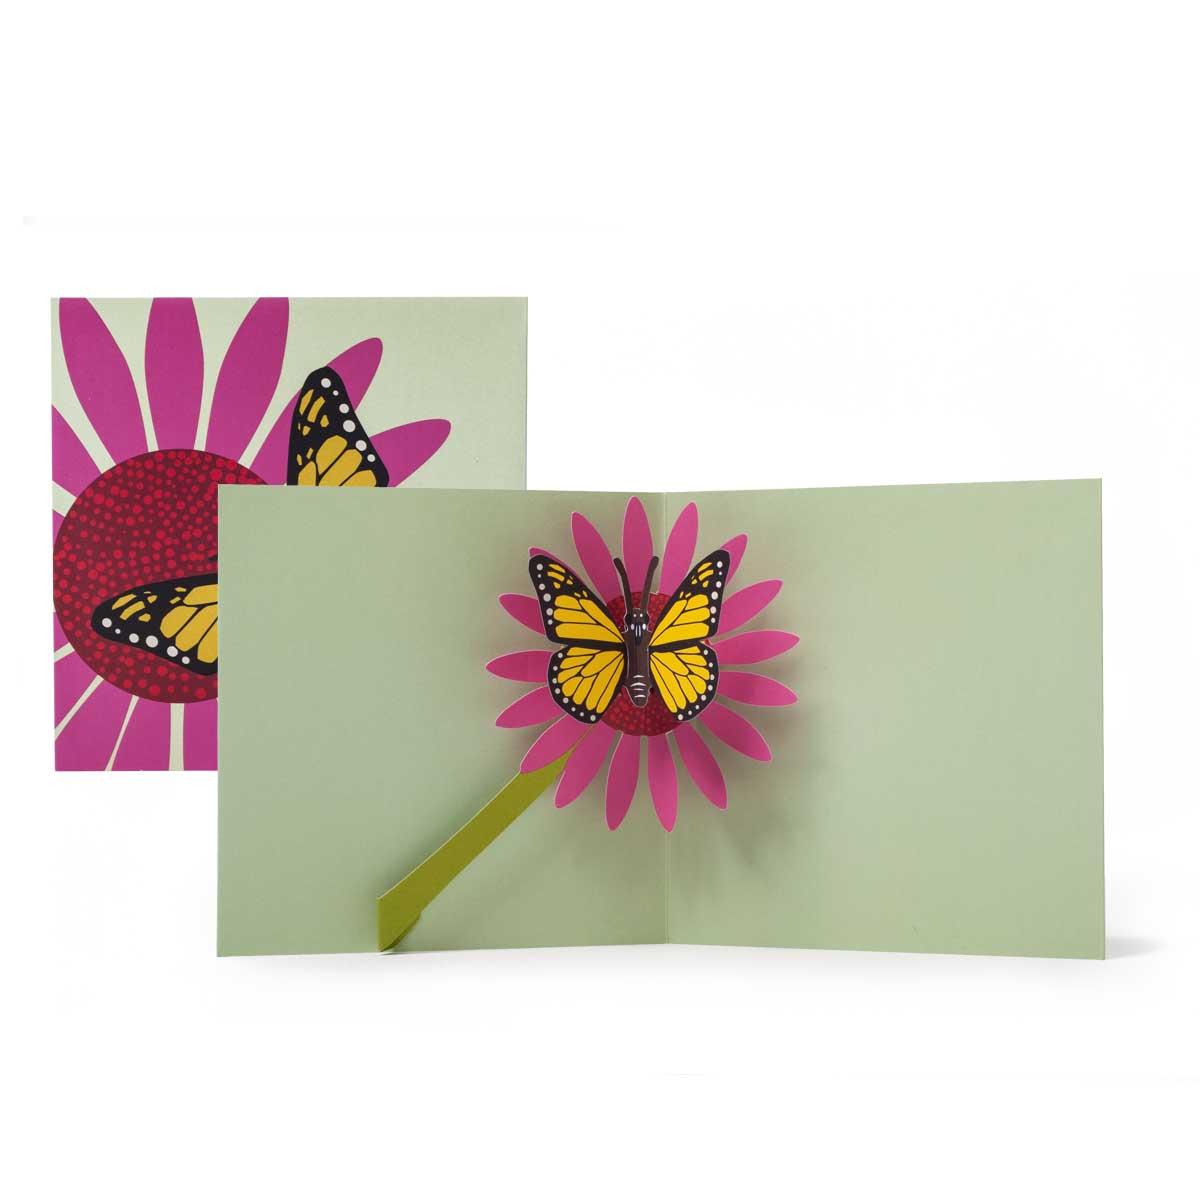 2-to-Tango_Butterfly-on-Flower_Pop-up-card_MaikeBiederstaedt.jpg